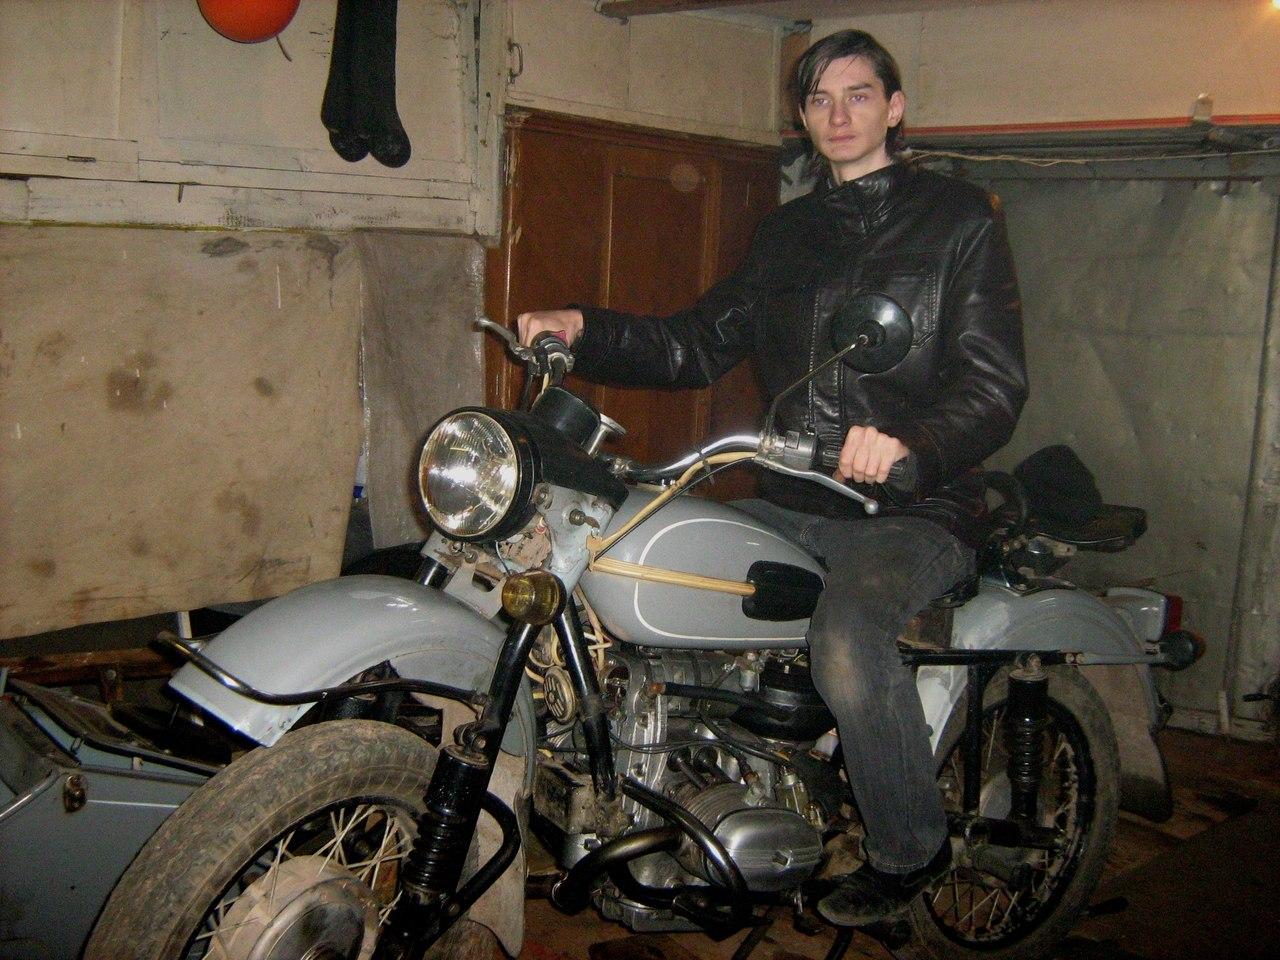 Гола на мотоциклі фото 77-202